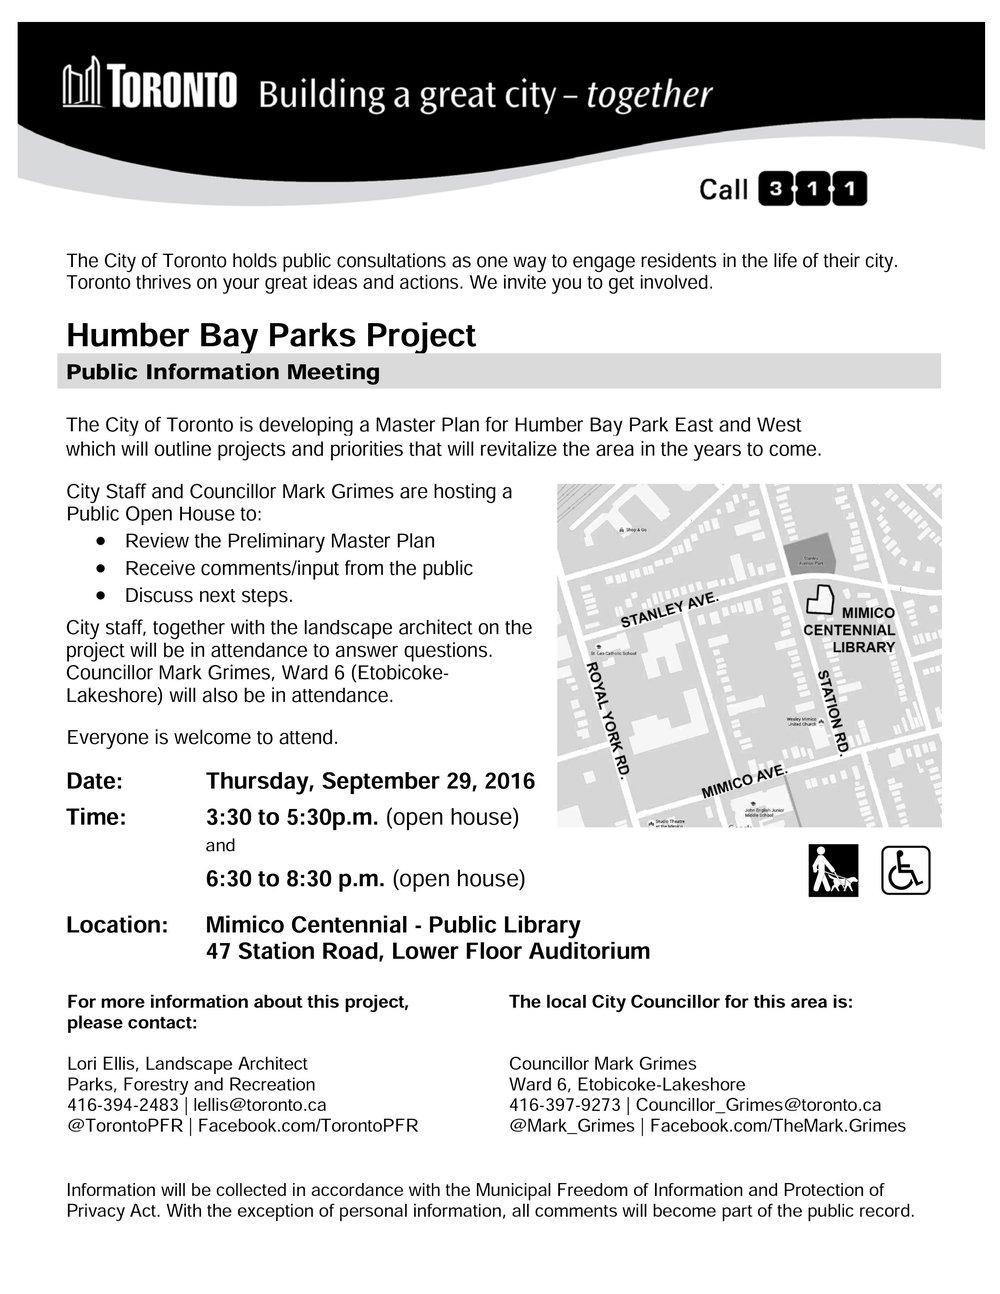 Humber Bay Parks.jpg